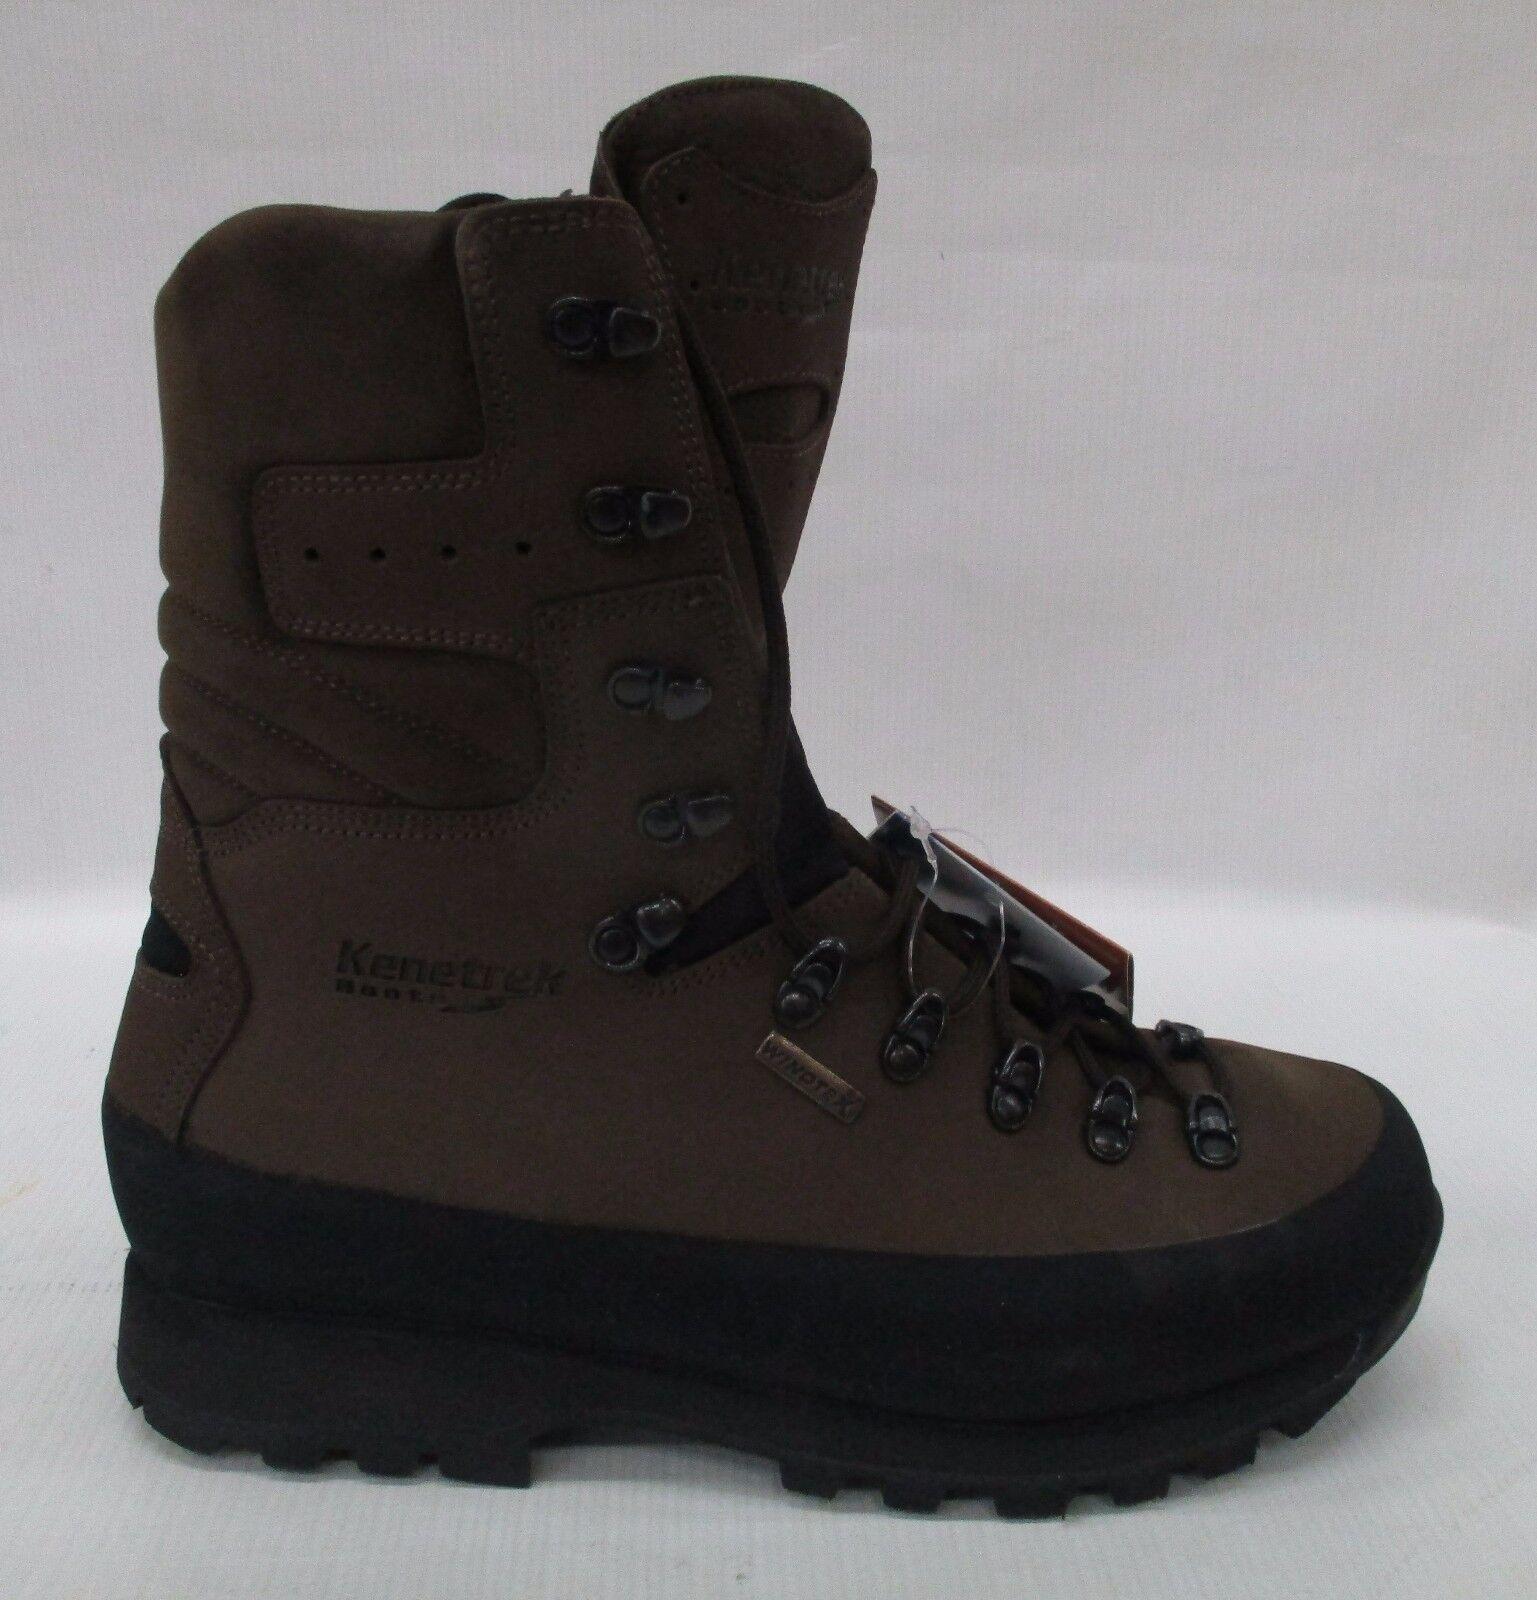 Kenetrek Uomo Pelle Mountain Extreme Stivali KE-420-NI Brown Pelle Uomo Size 12 67bd22